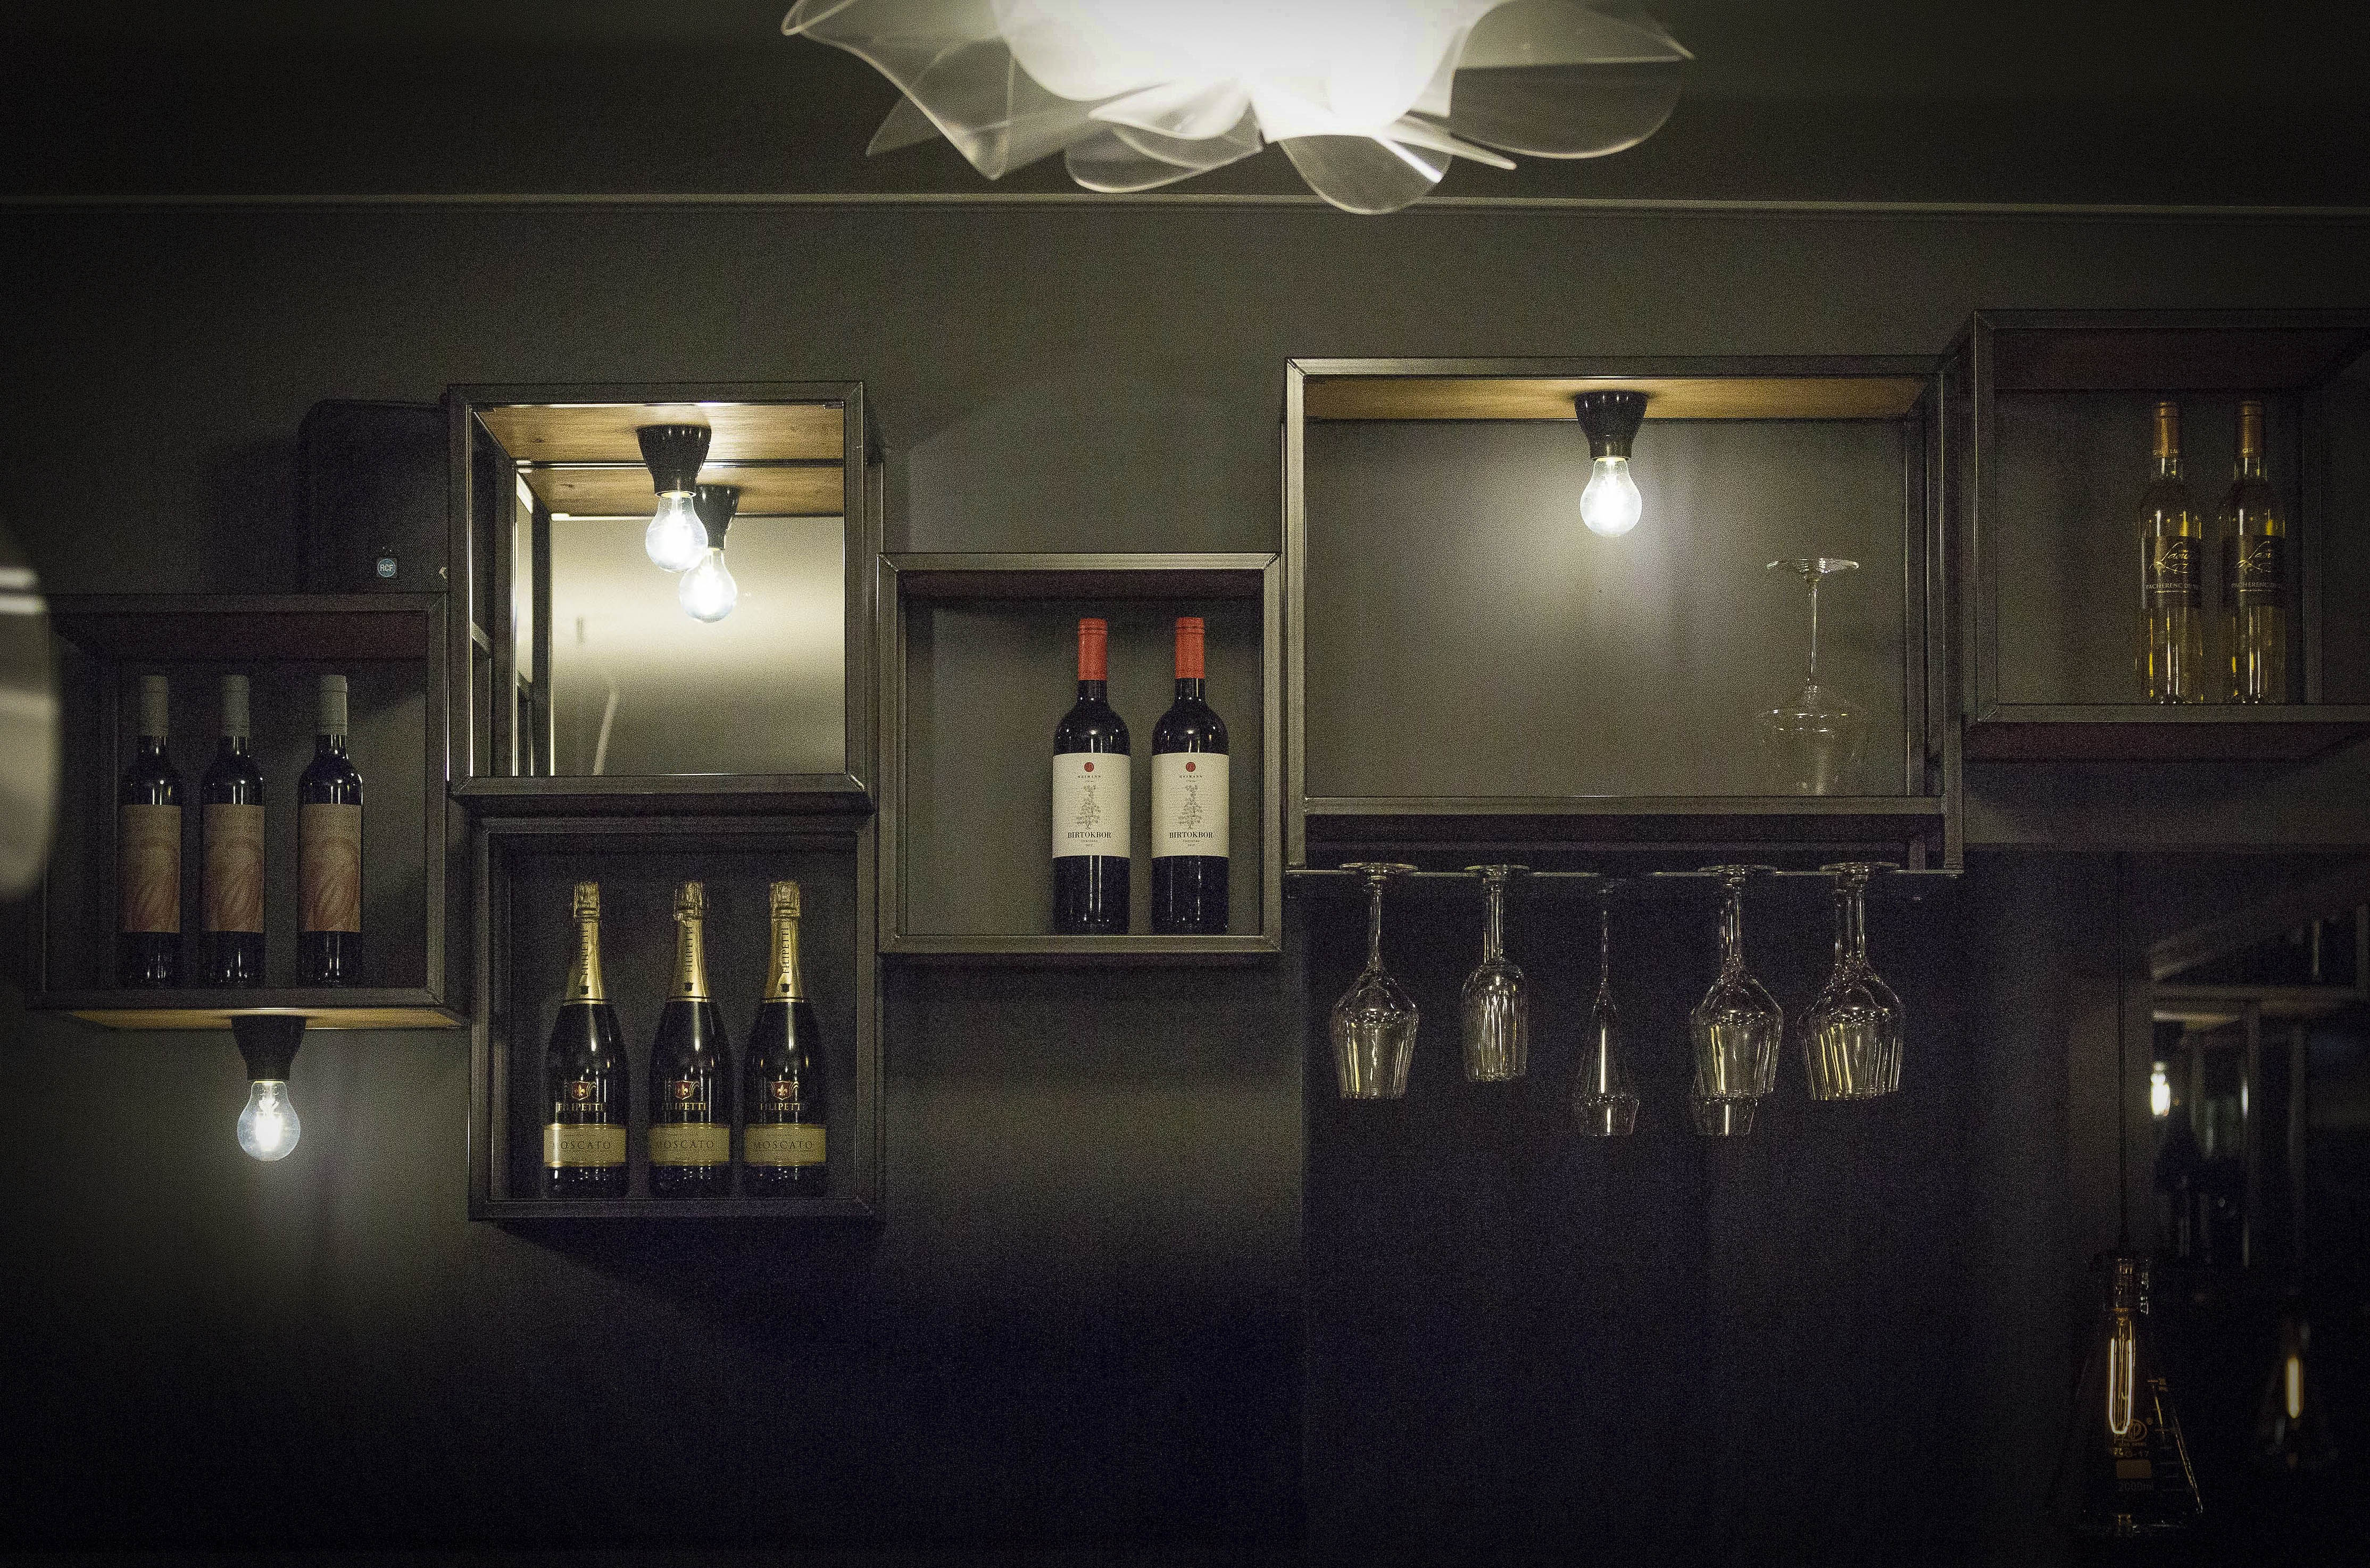 A work by Does - 2 Digital Does Zinc Restaurant_Blickfänger01-smaller